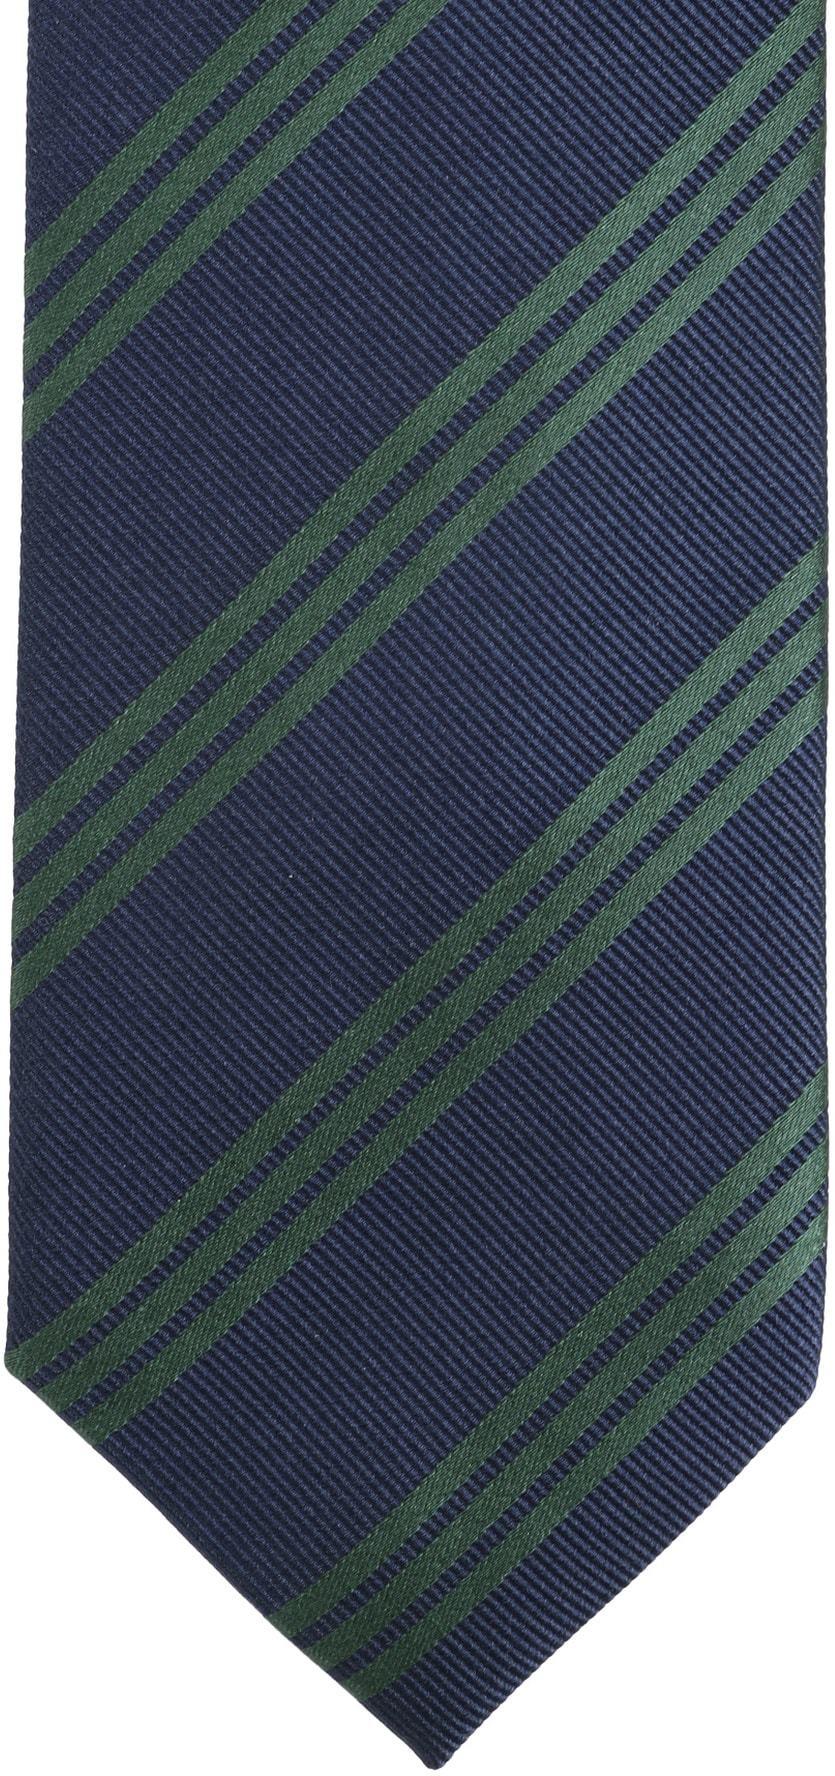 Krawatte Seide Streifen Navy Grun foto 2